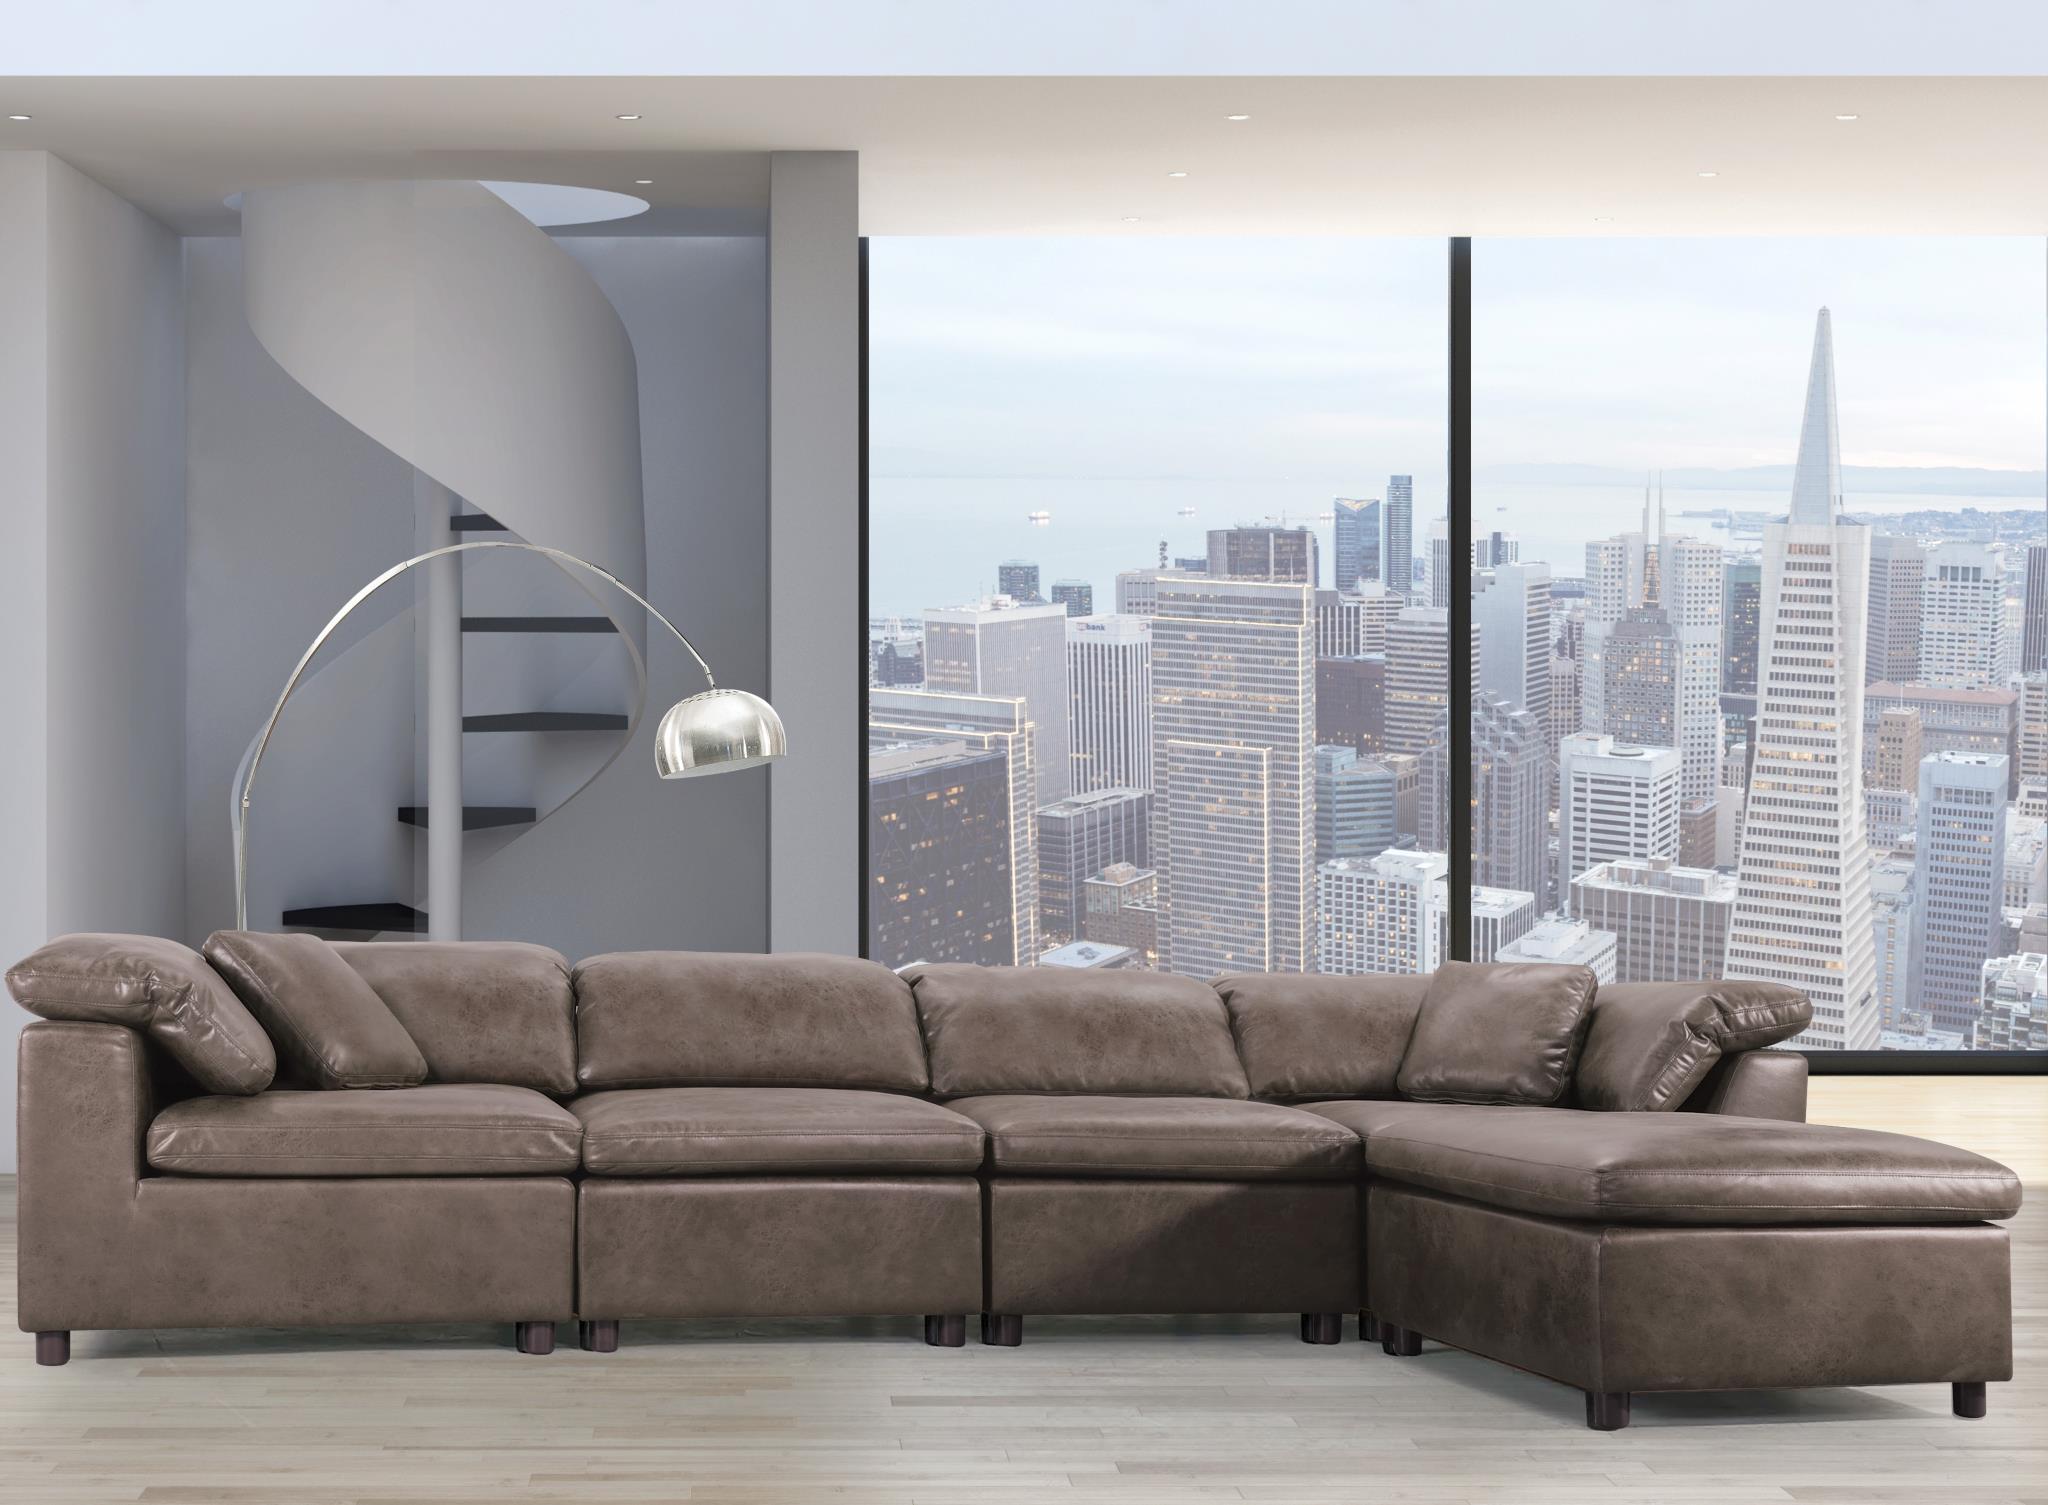 2-Tone Brown Stone Sectional Sofa